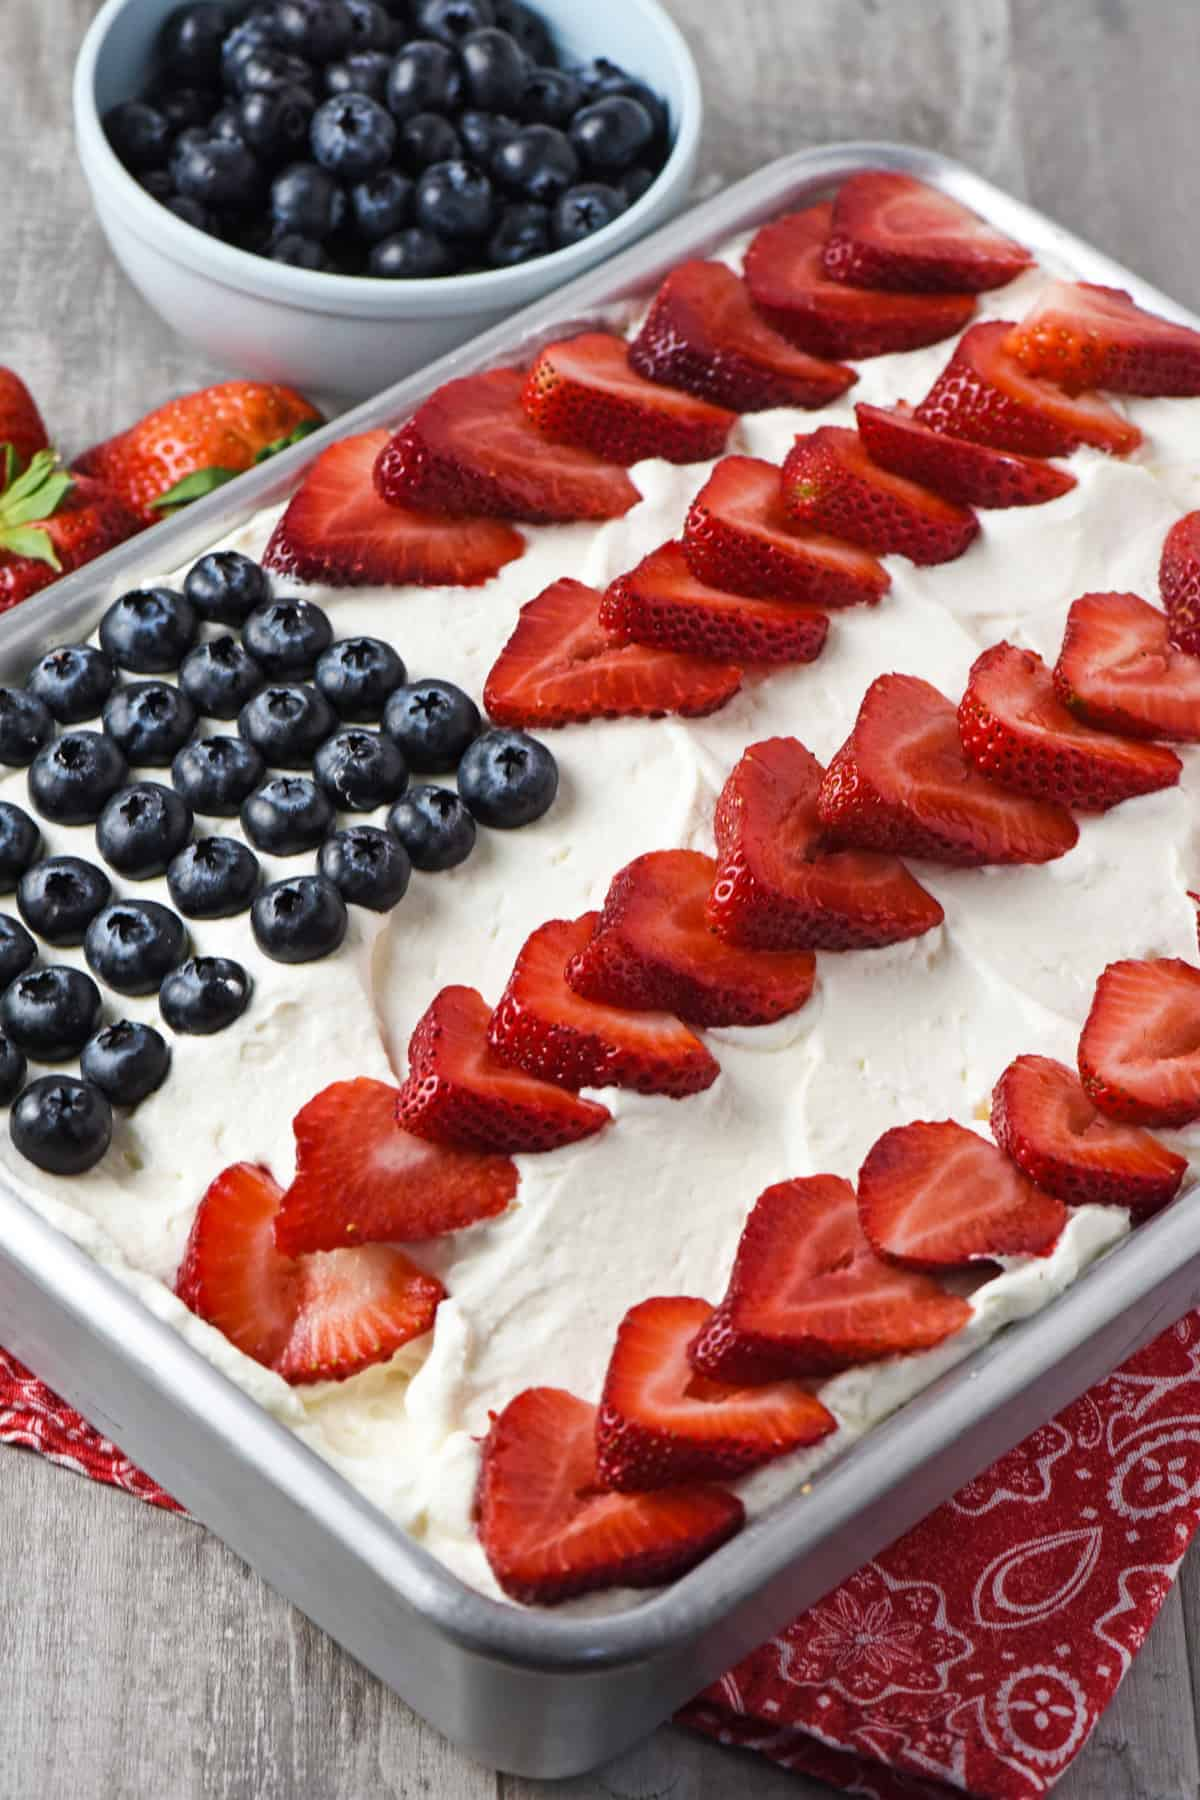 American flag cake in metal cake pan